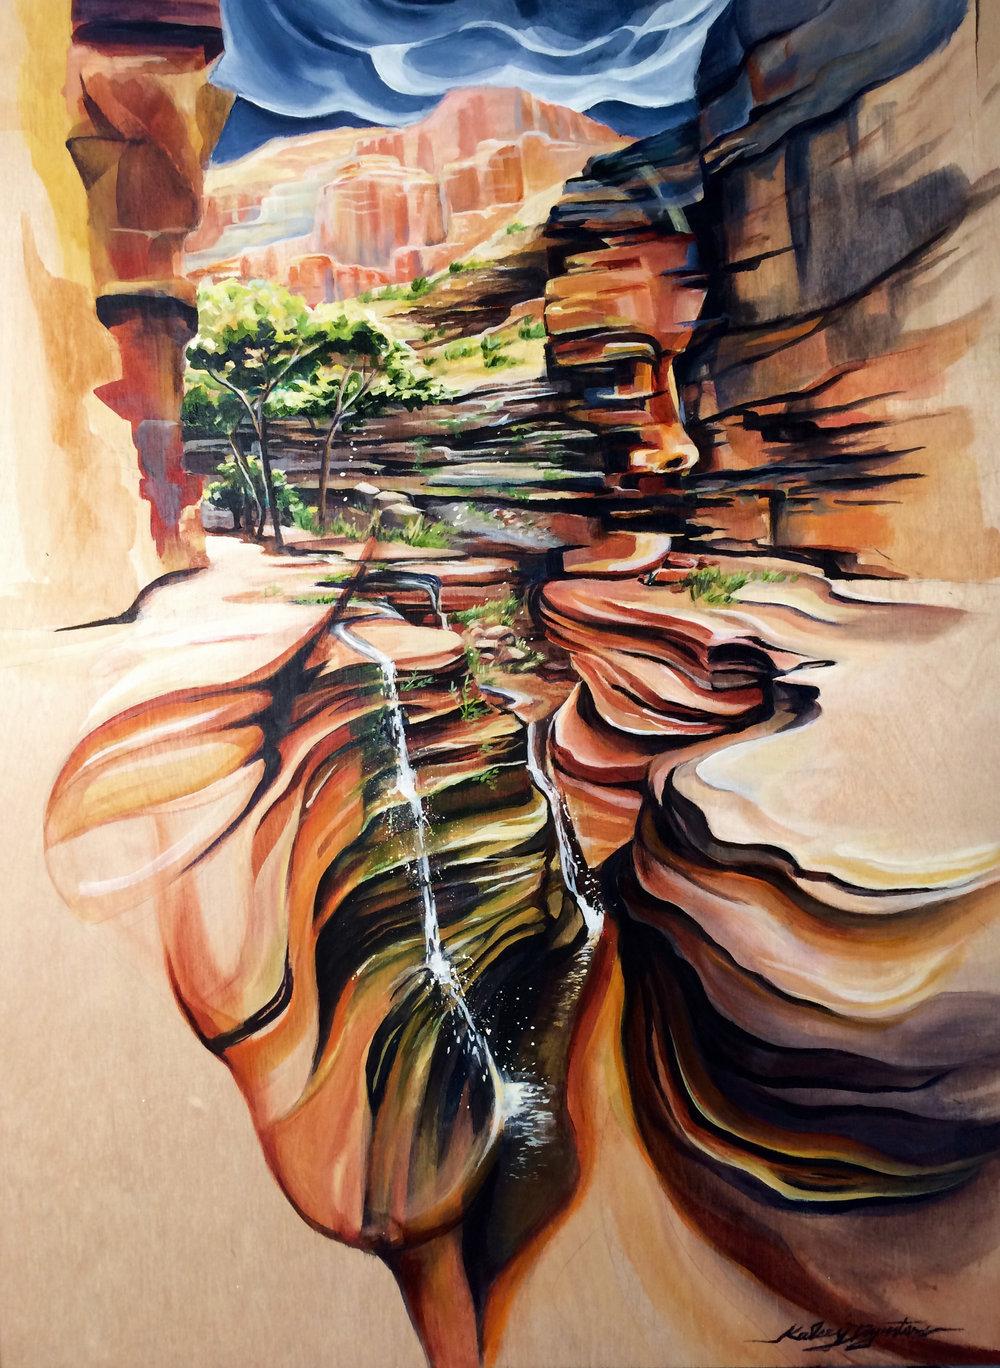 Into the Narrows, Deer Creek Falls, acrylic on wood, 18x24